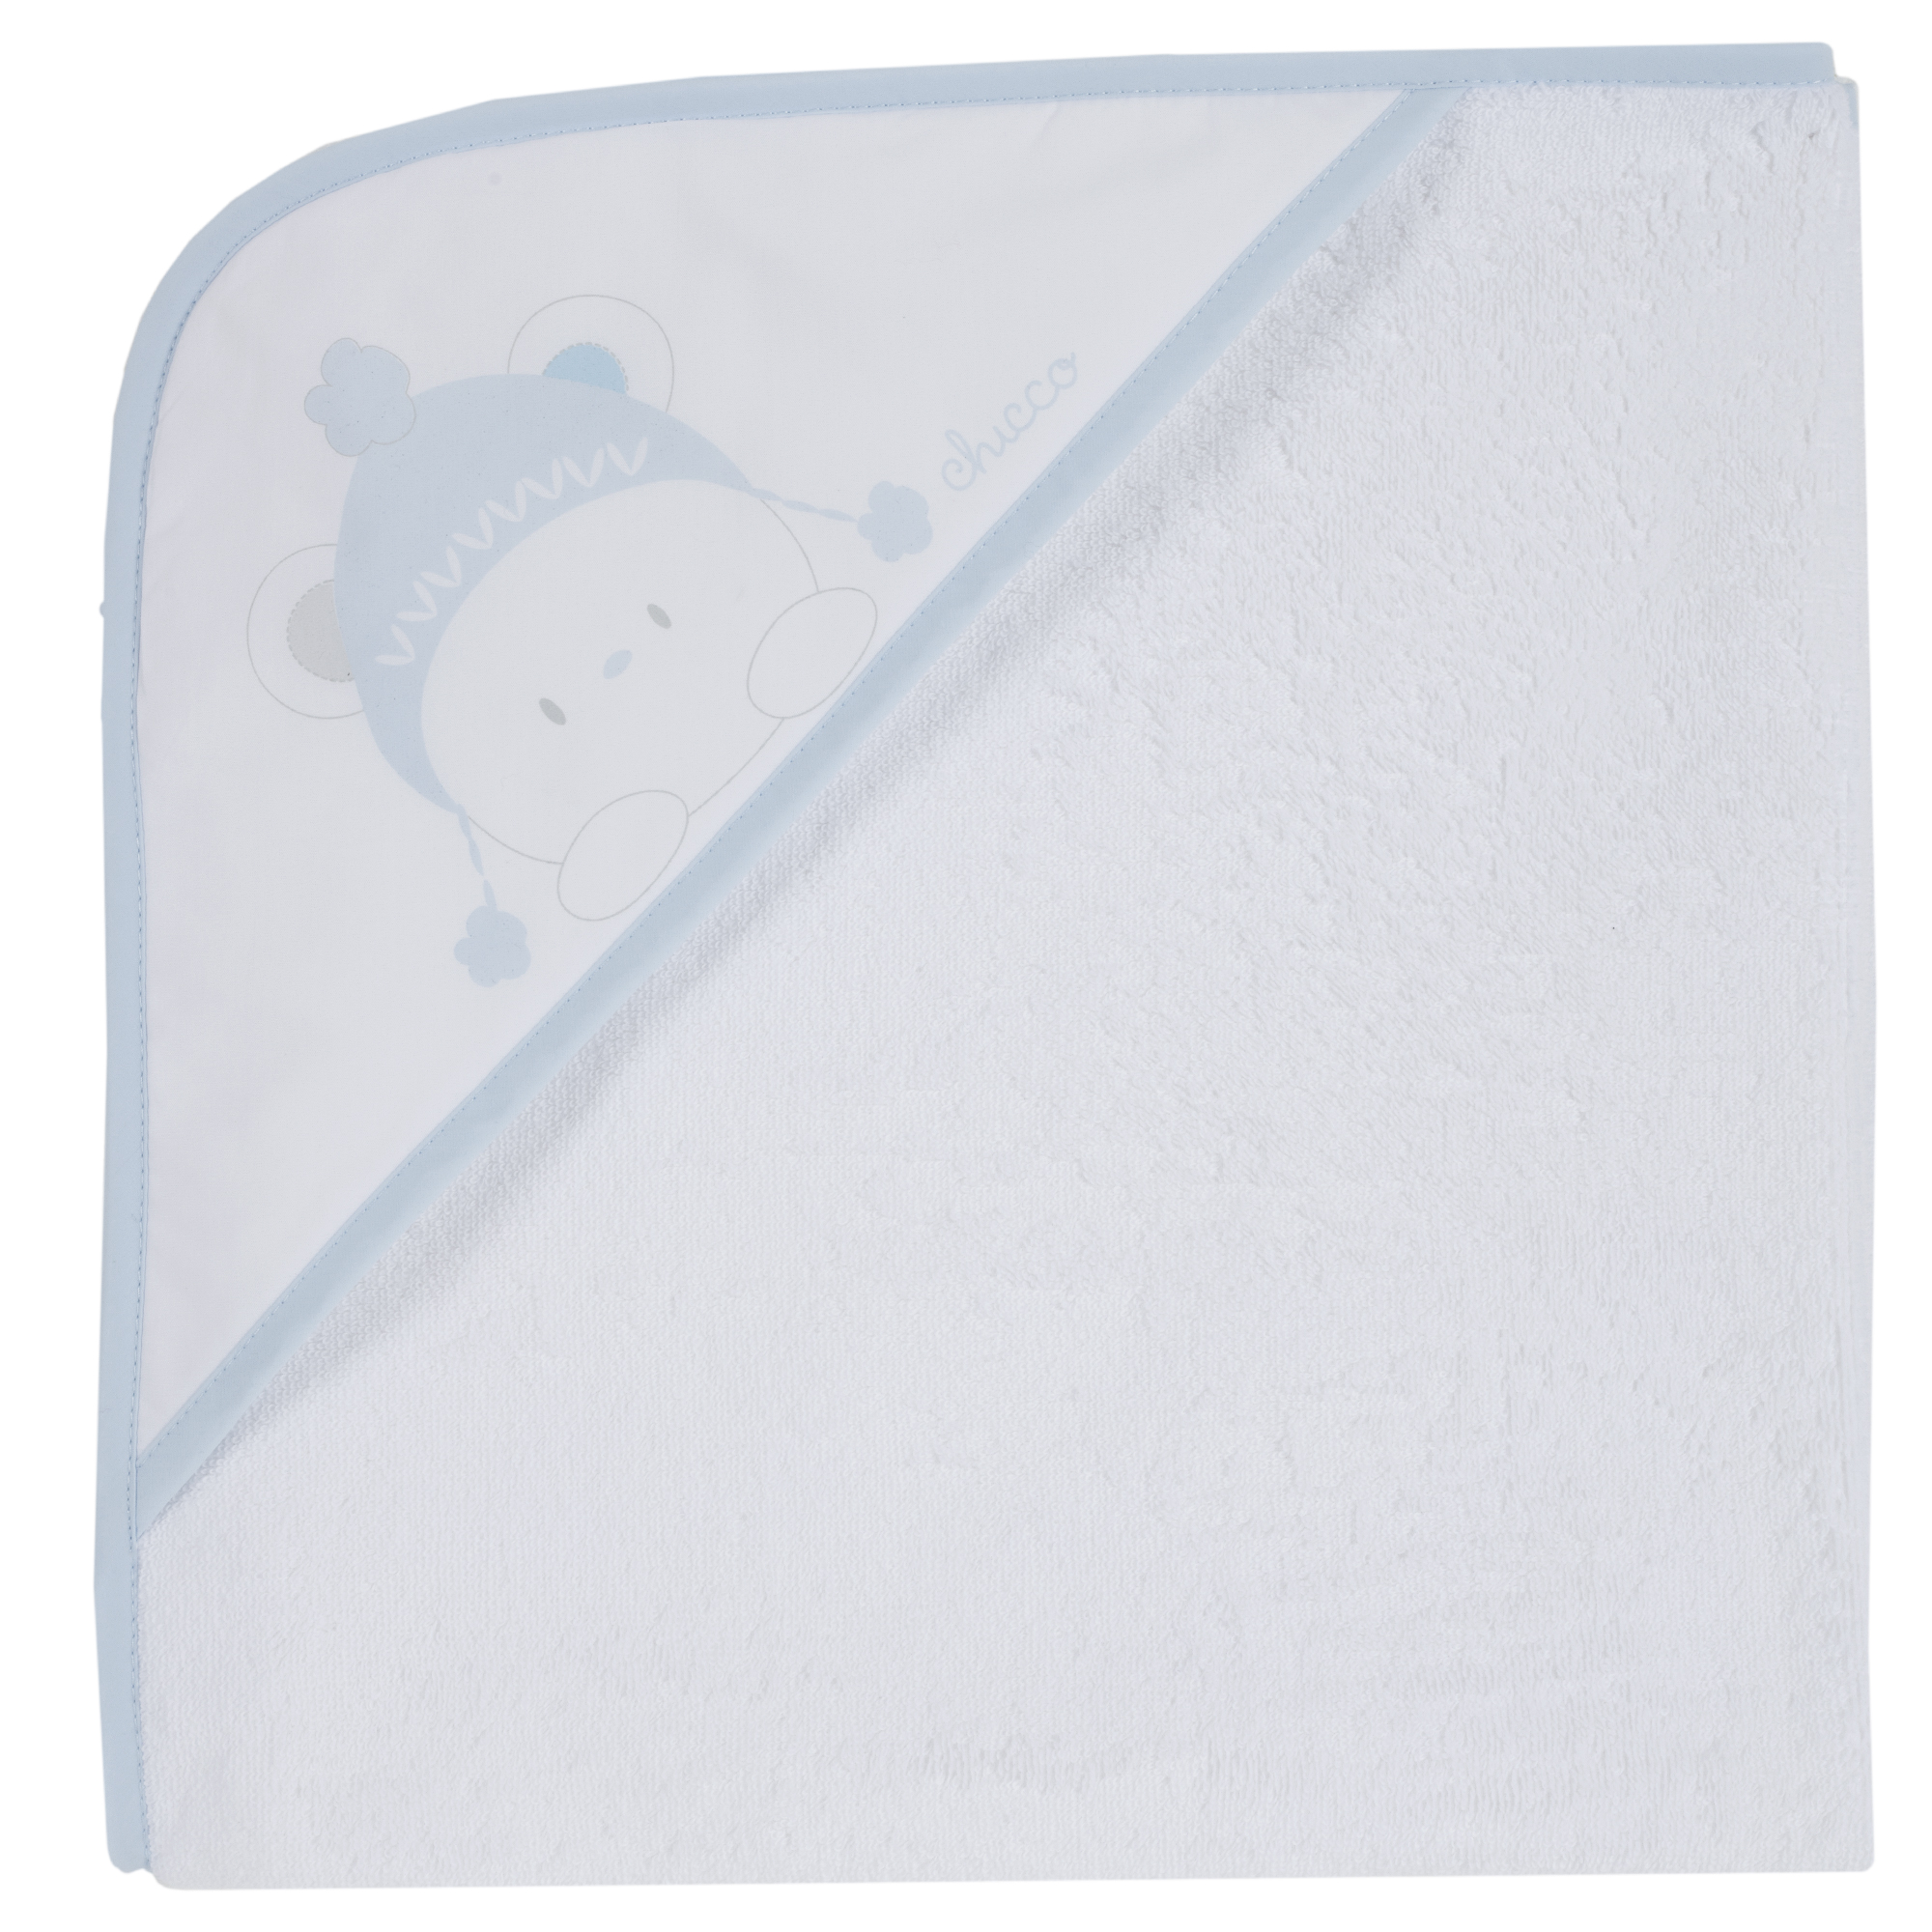 Prosop baie bebelusi Chicco alb cu albastru 99